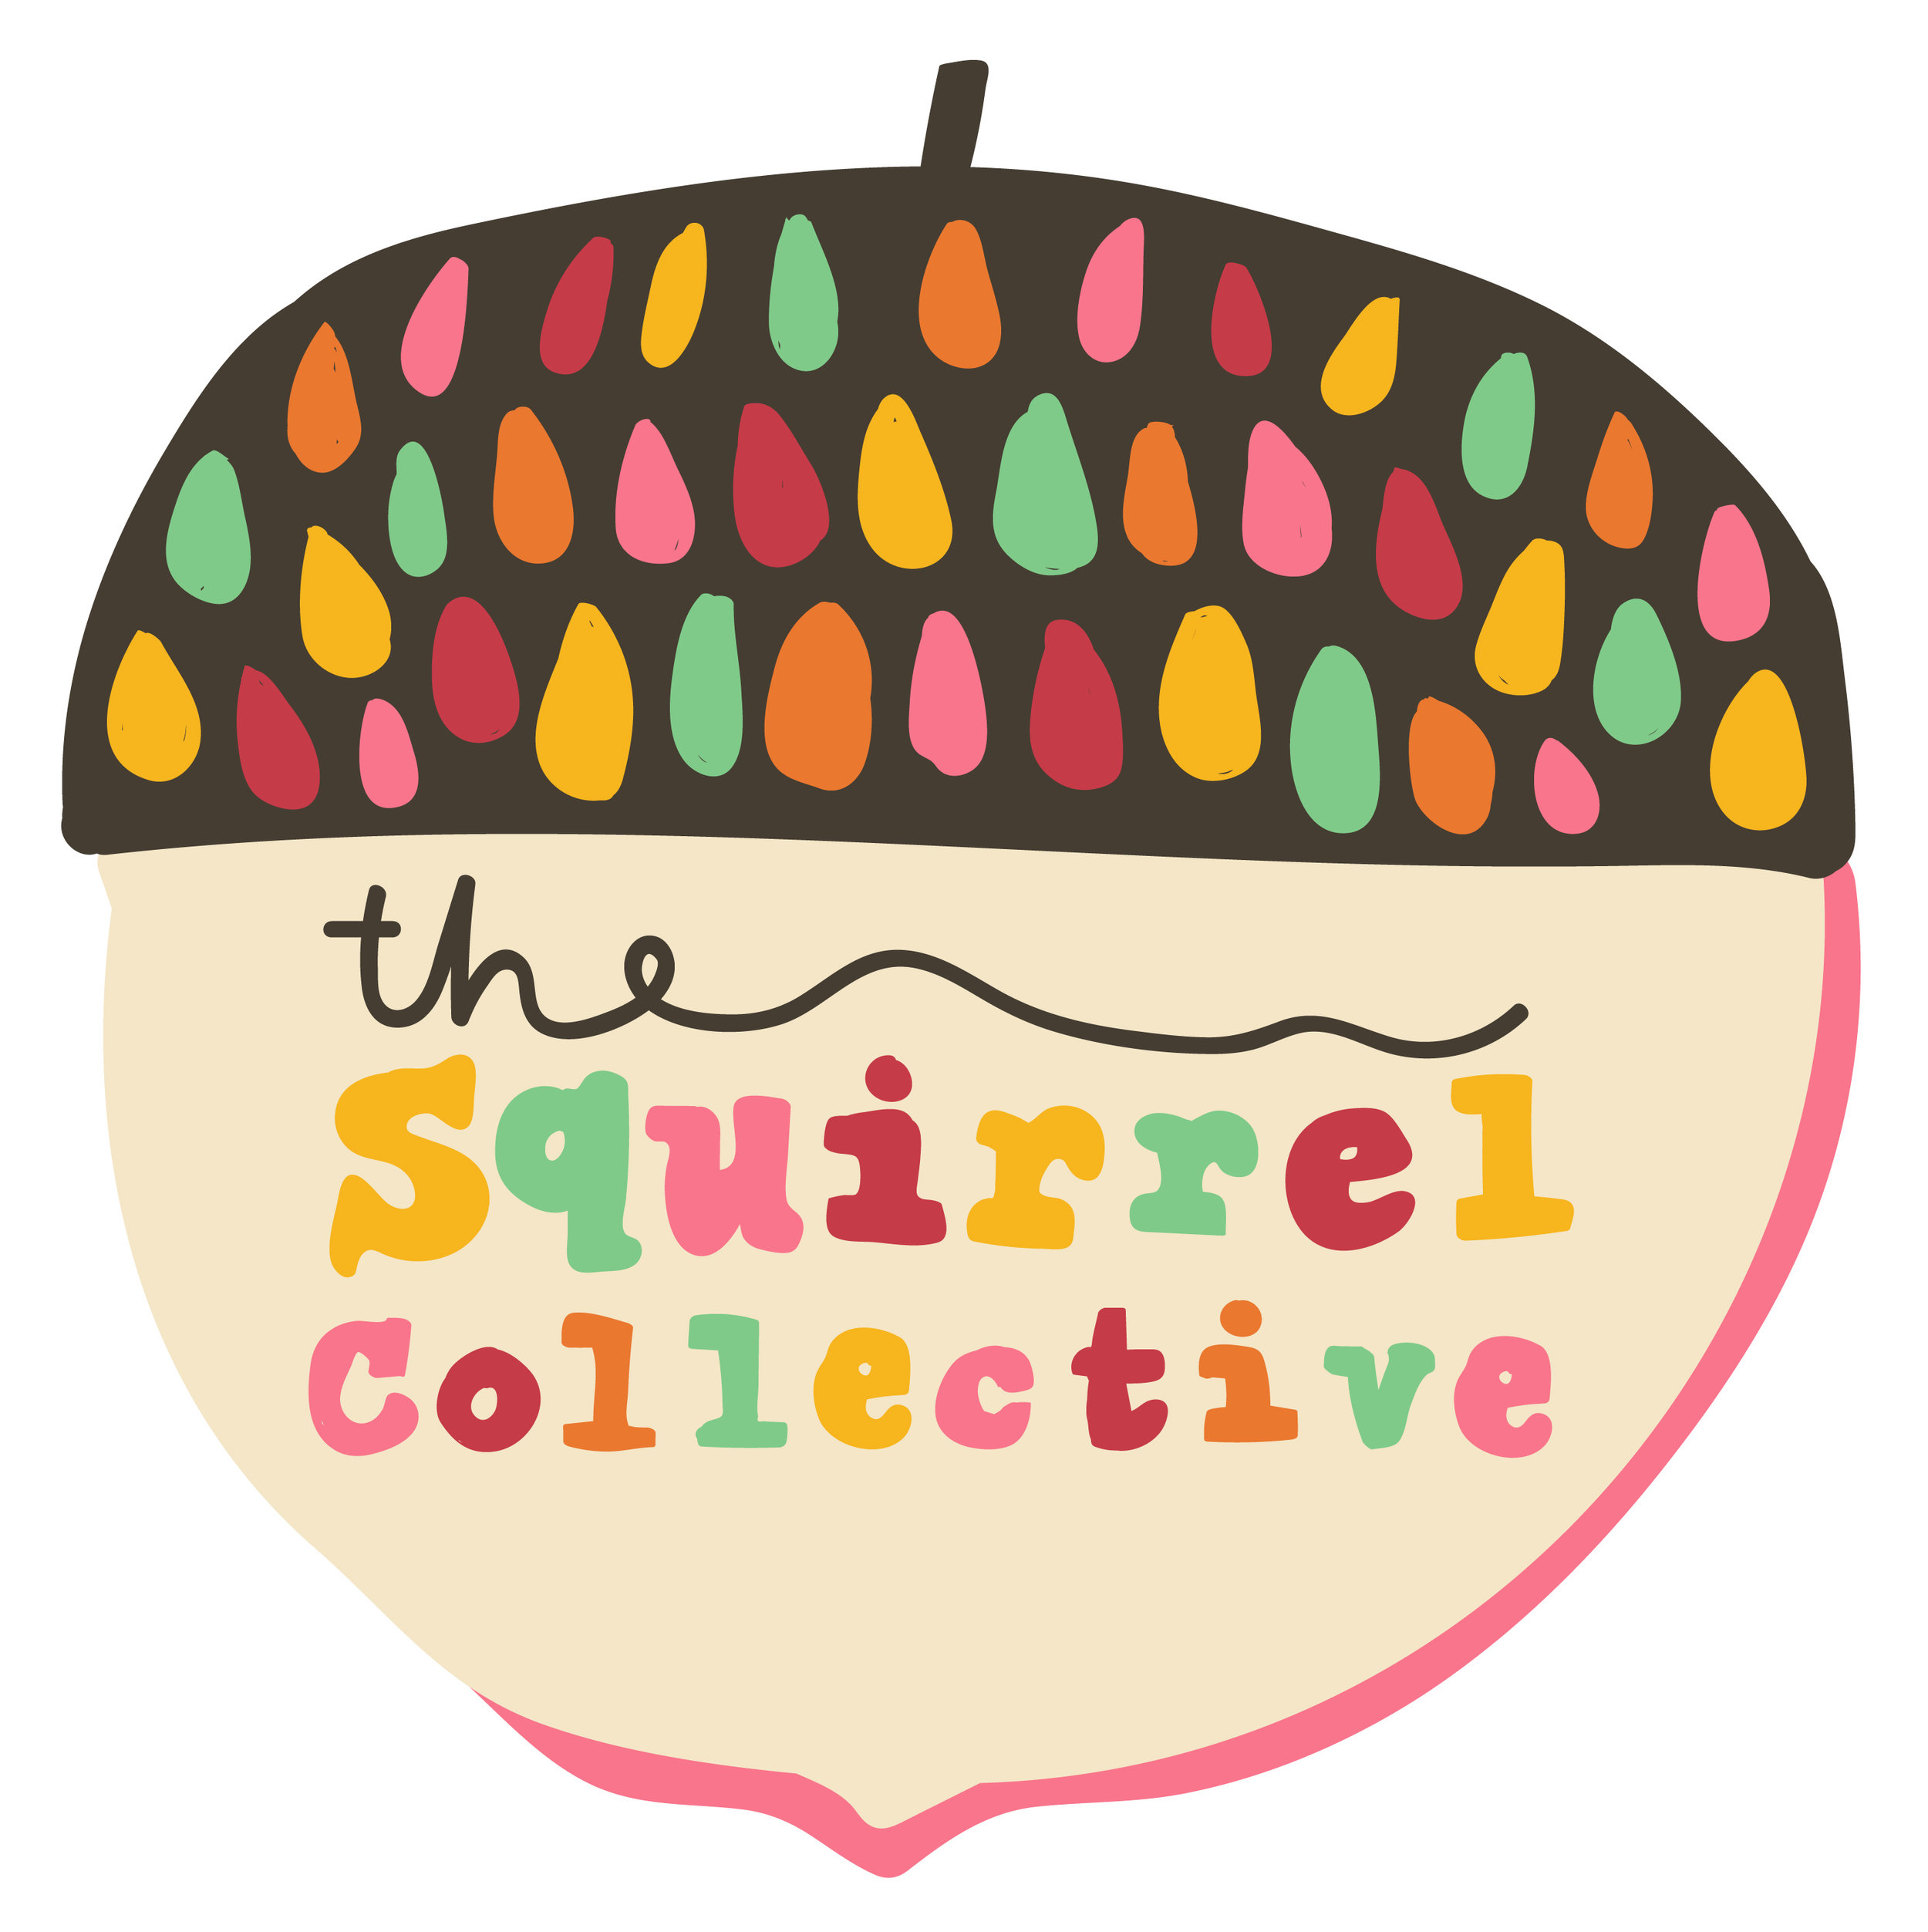 The Squirrel Collective_logo FINAL.jpg